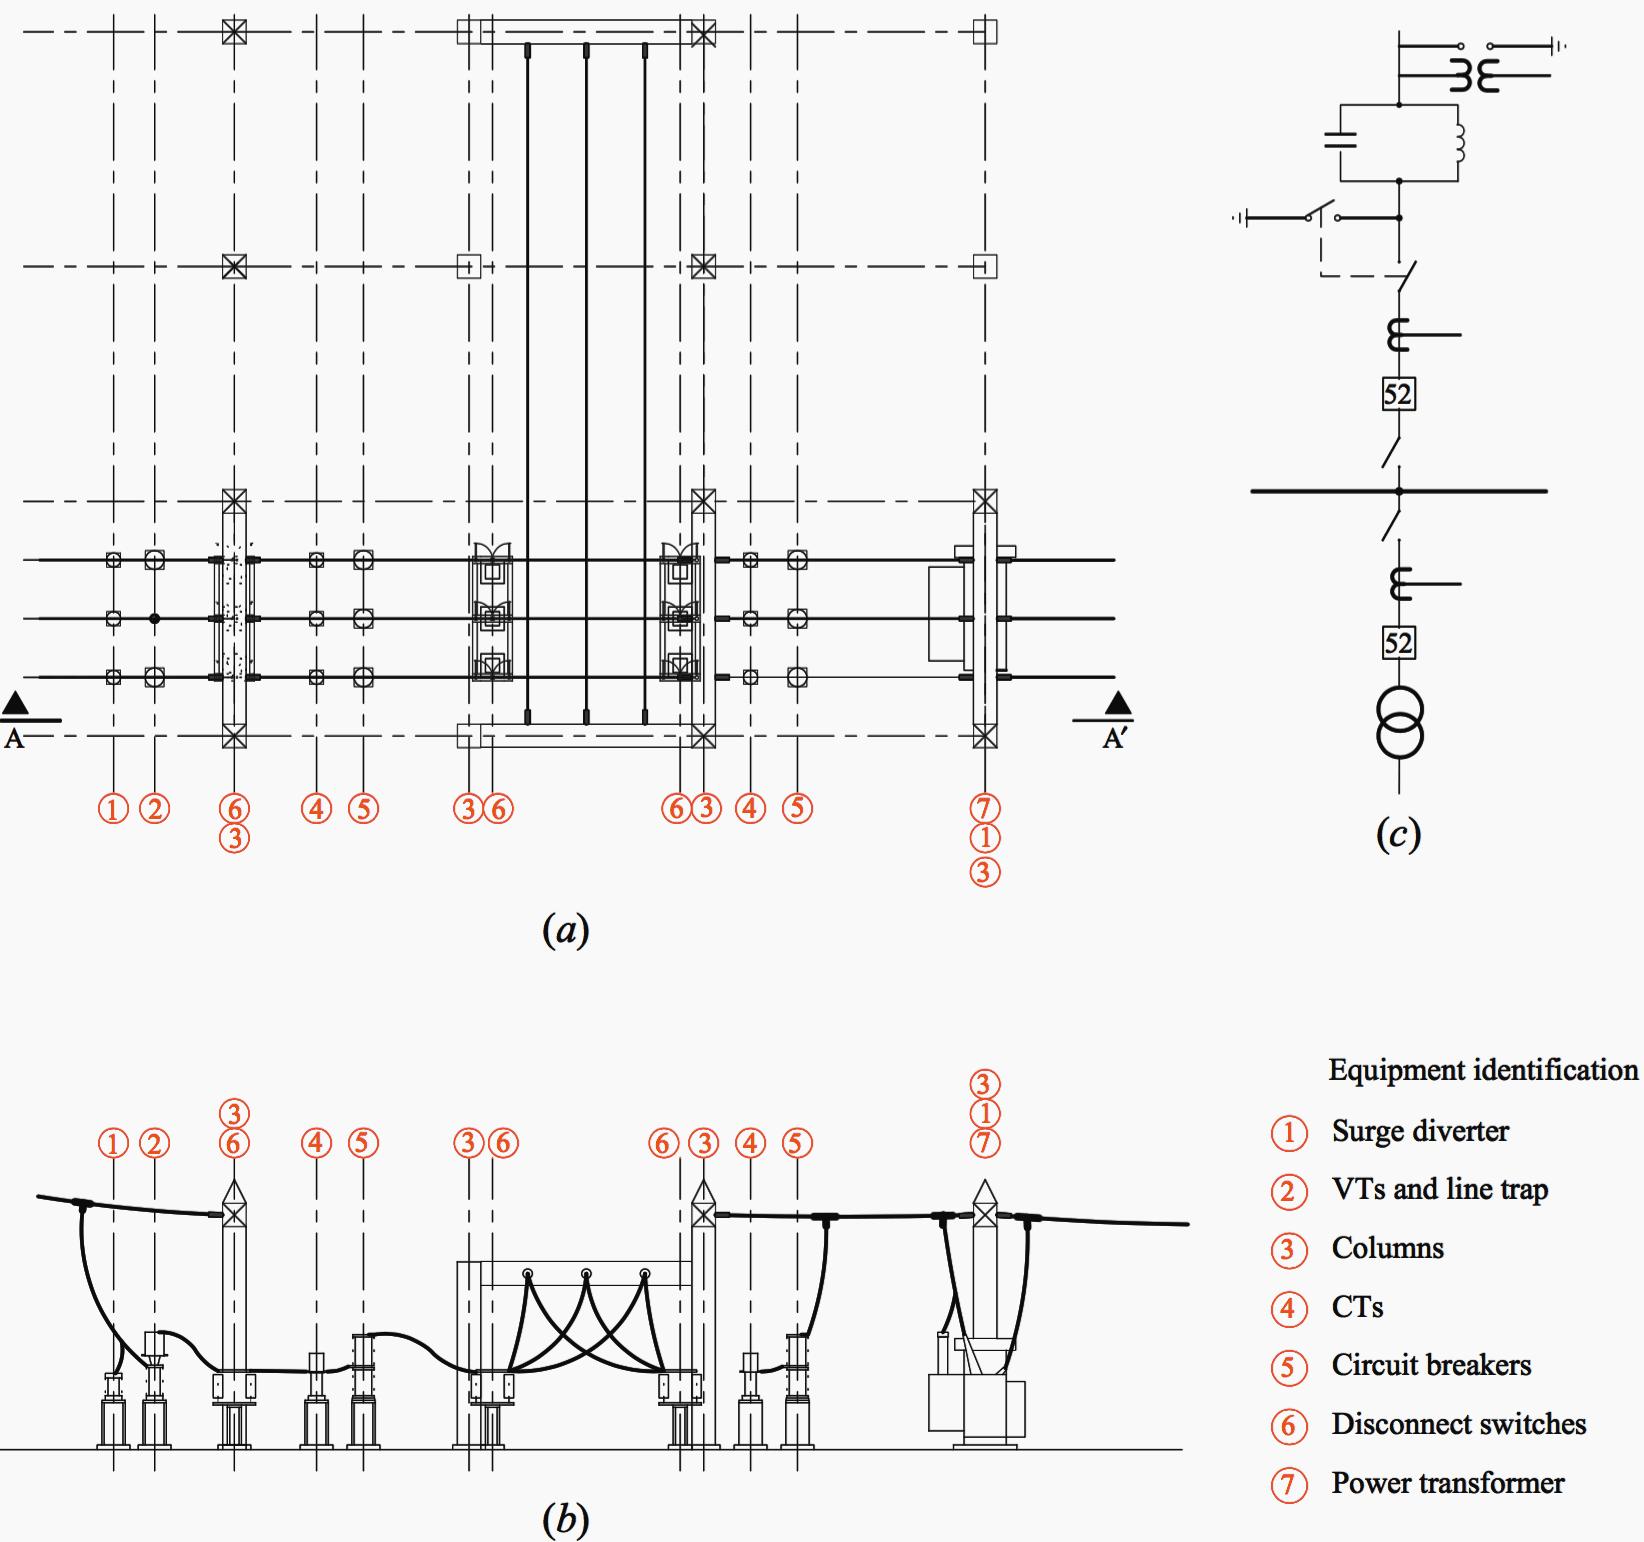 engineering line diagram symbols